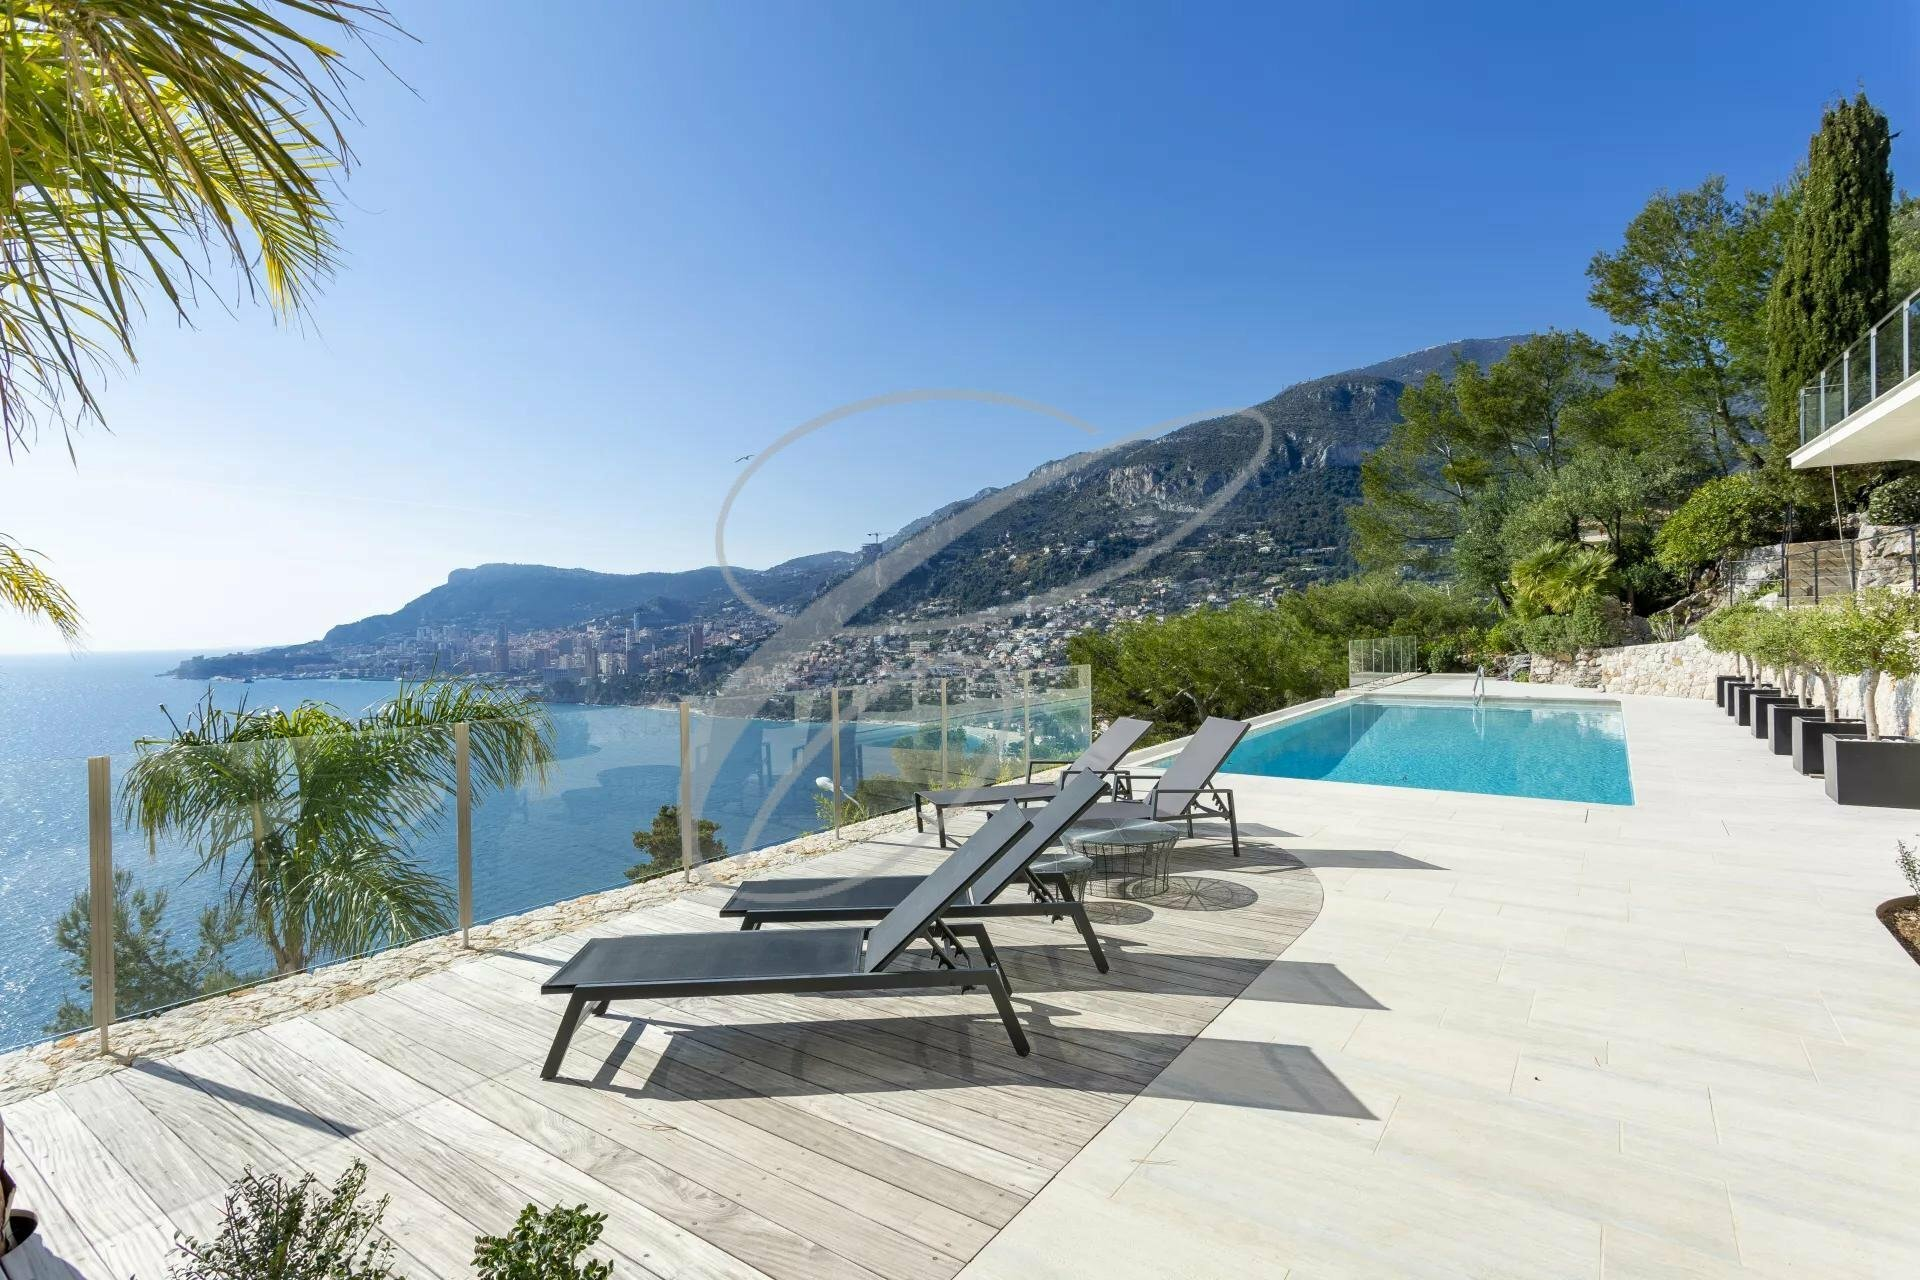 Villa in Roquebrune-Cap-Martin, Provence-Alpes-Côte d'Azur, France 1 - 10966446